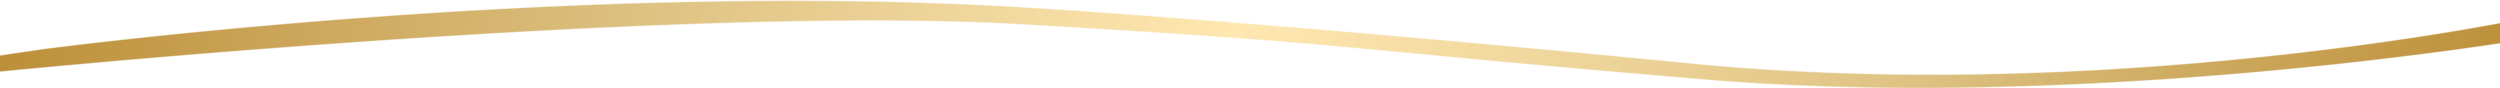 DoveRBP_Gold Gradient Ribbon_thin-02.png